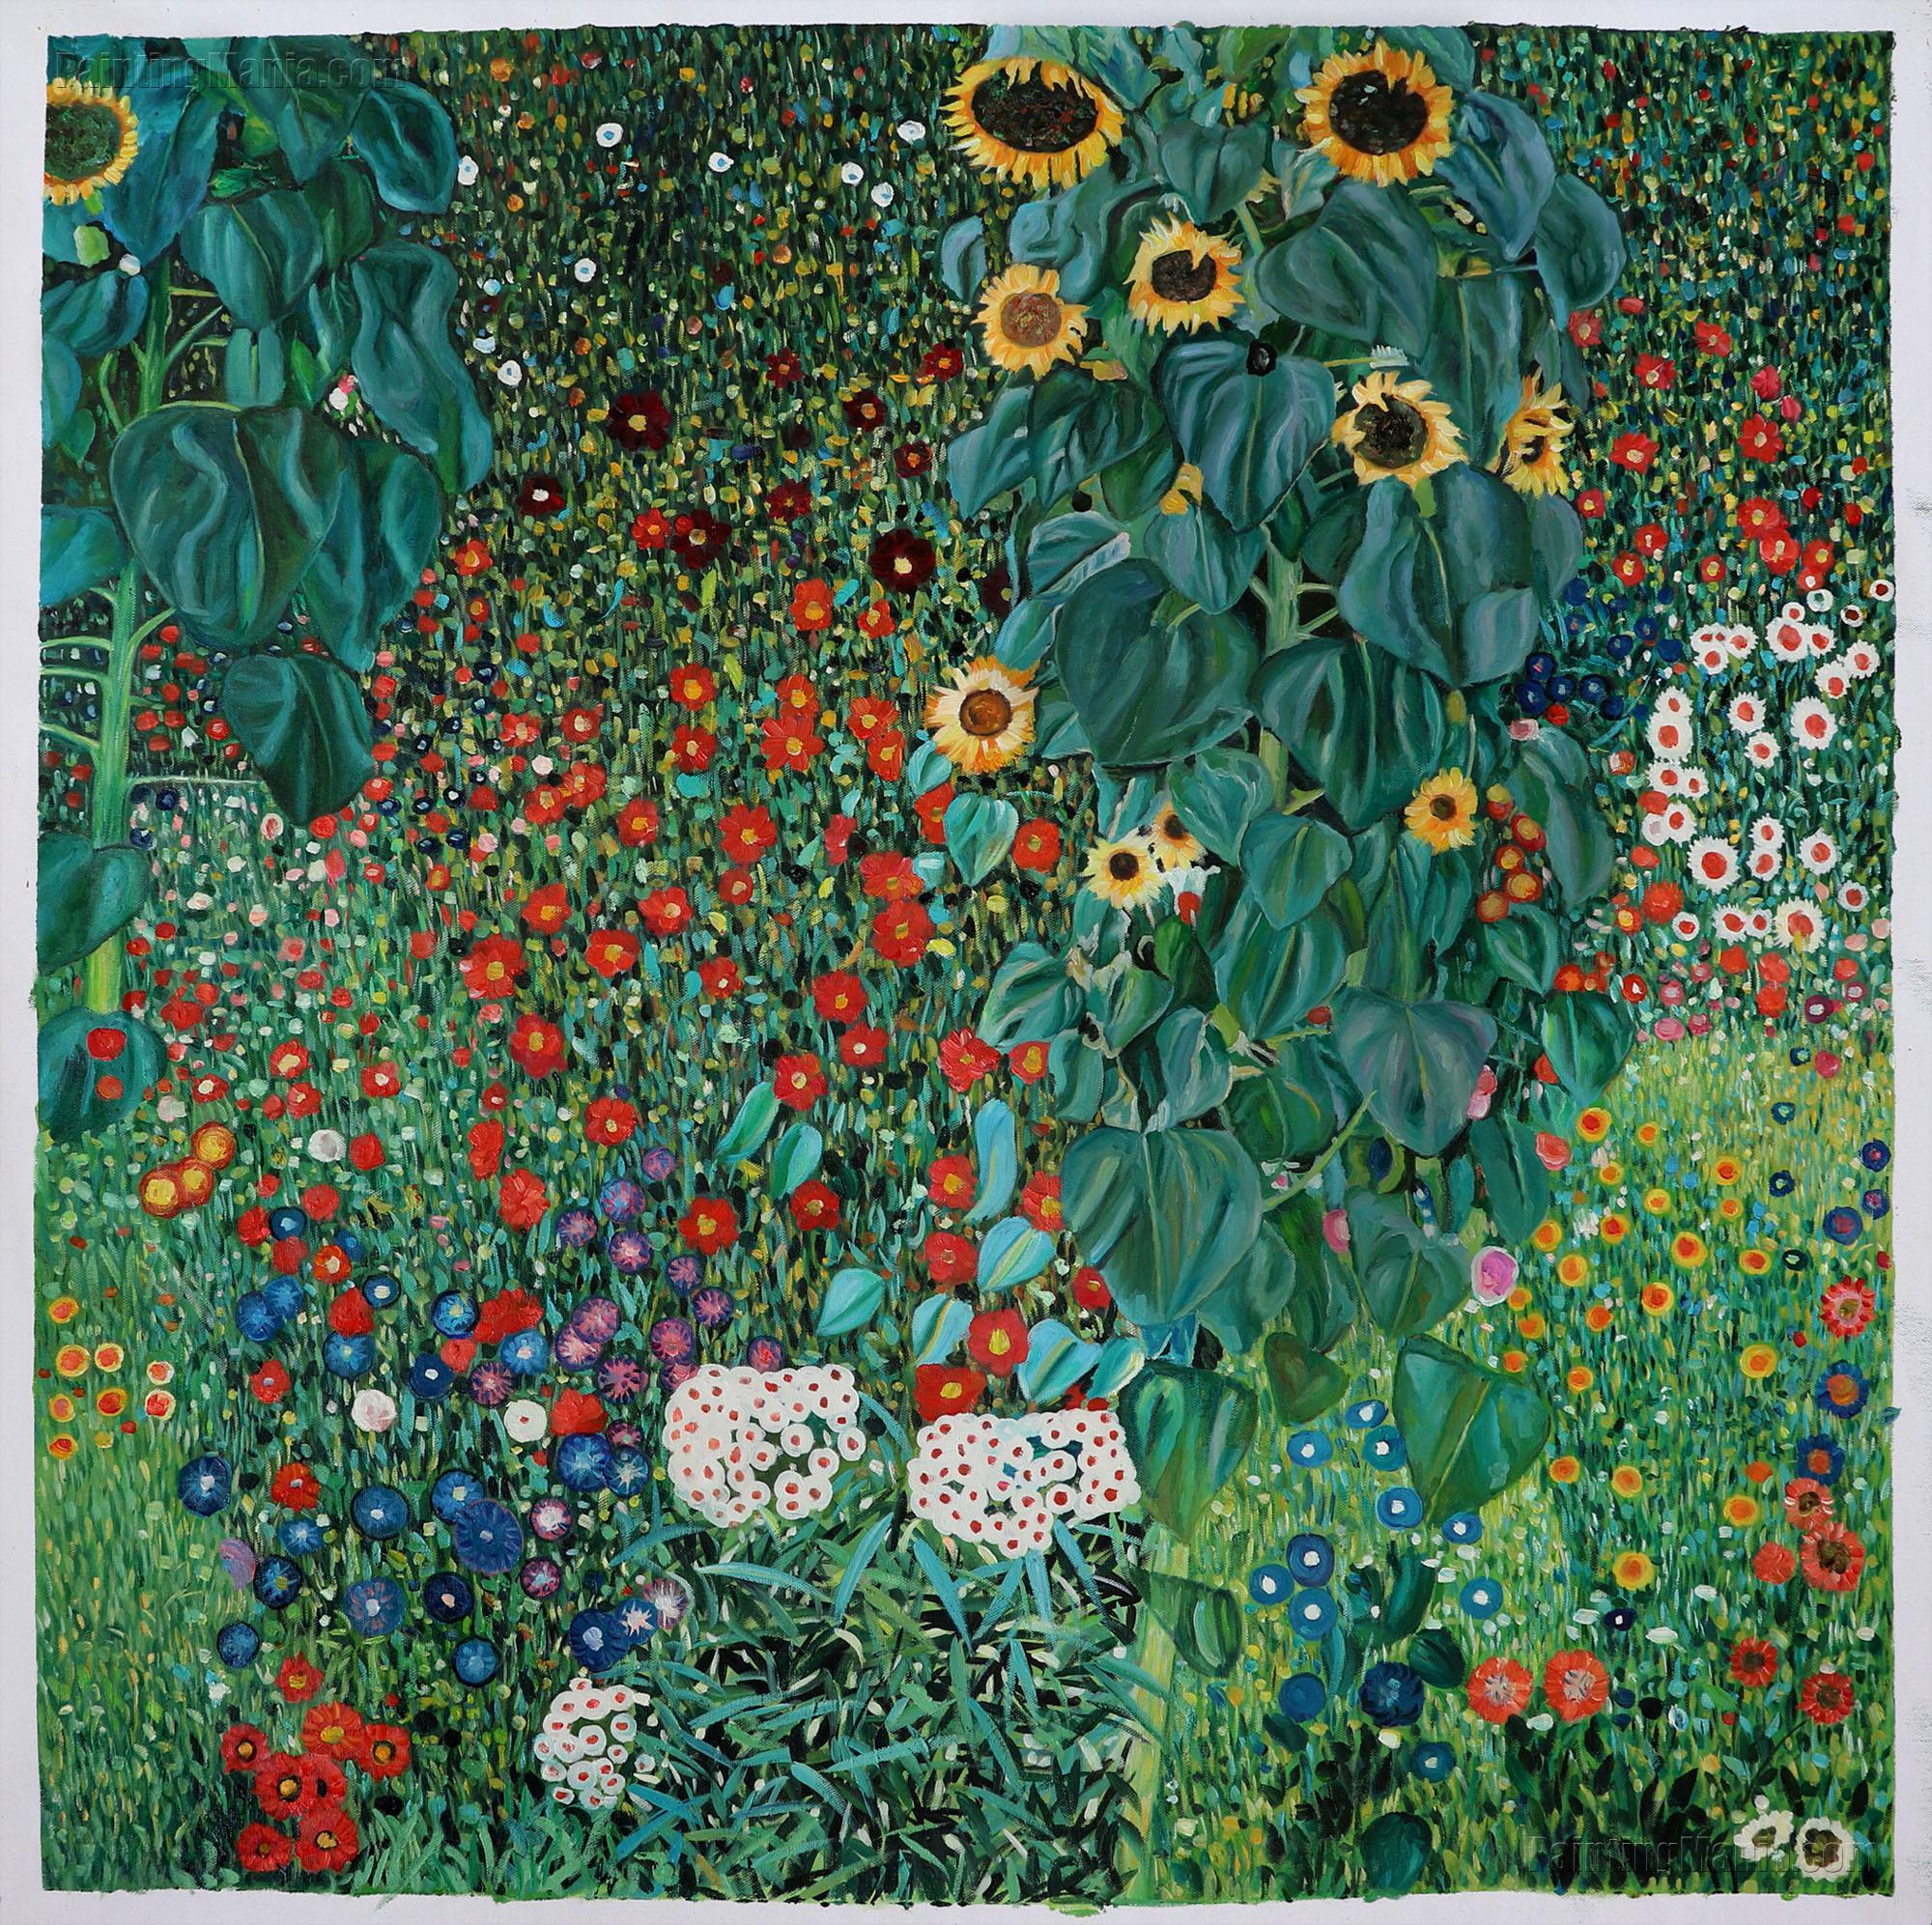 farm garden with sunflowers gustav klimt paintings